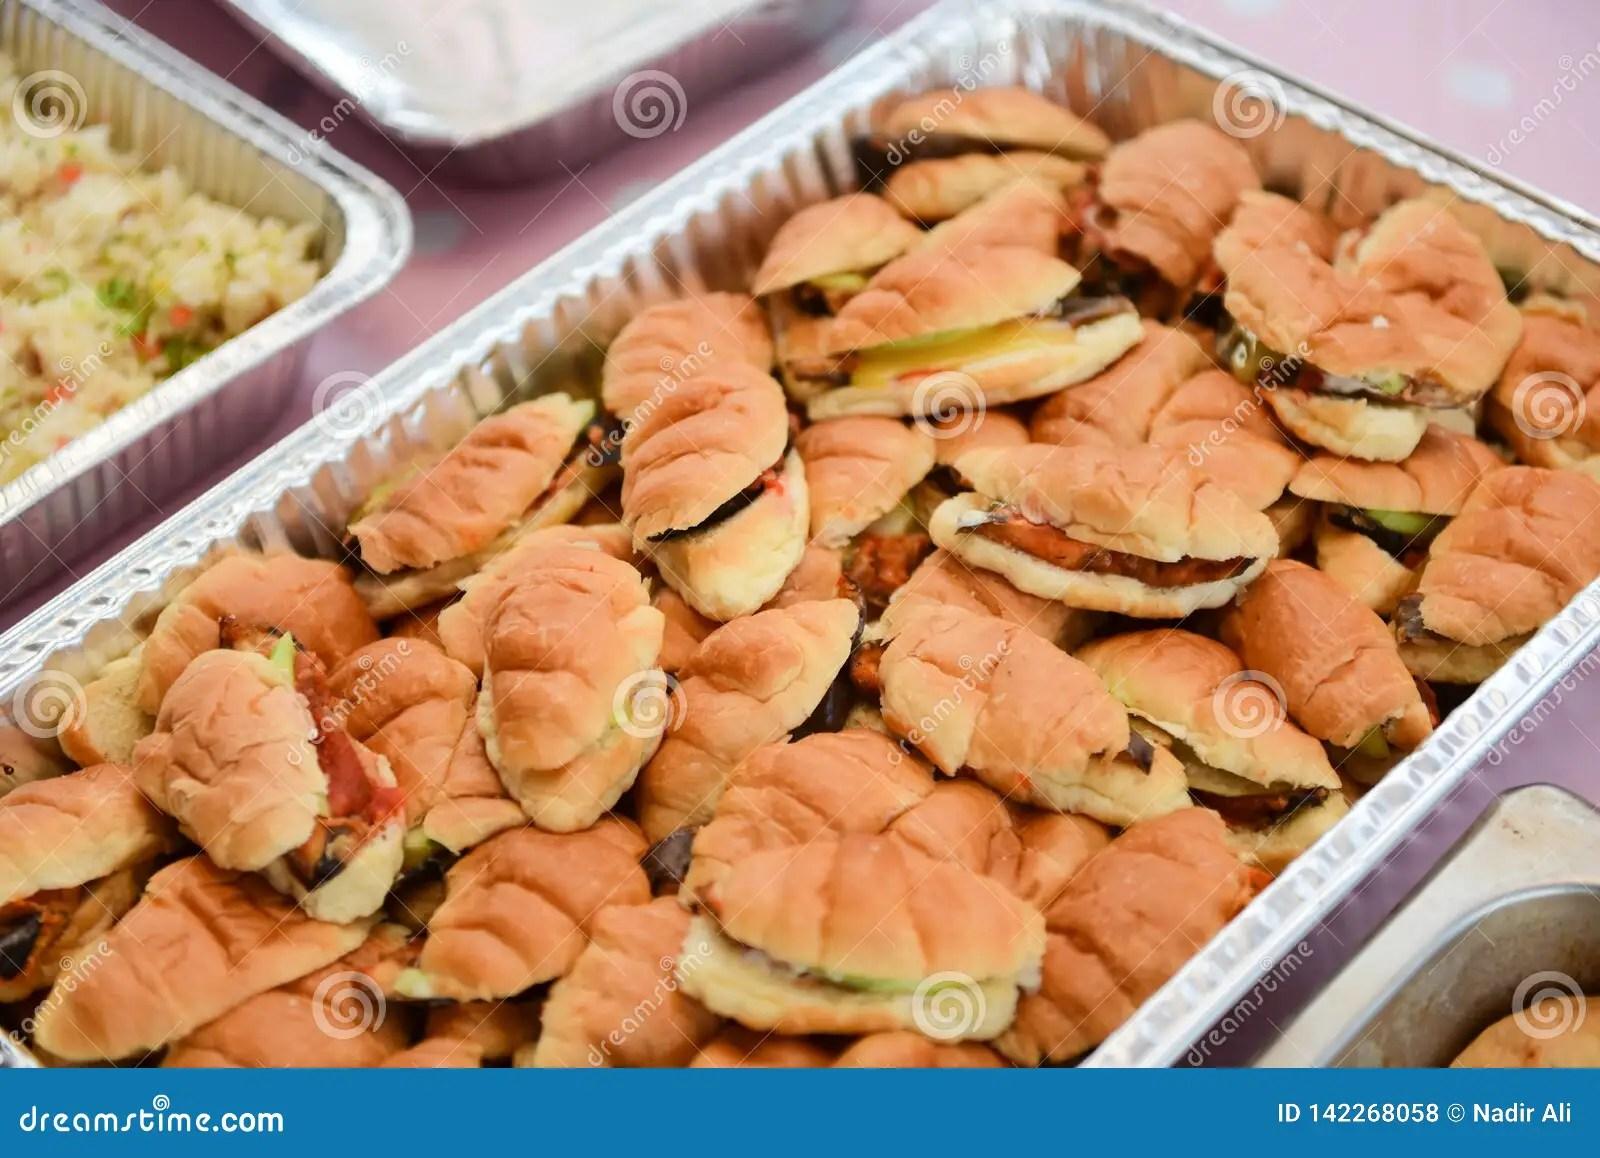 savory finger food at